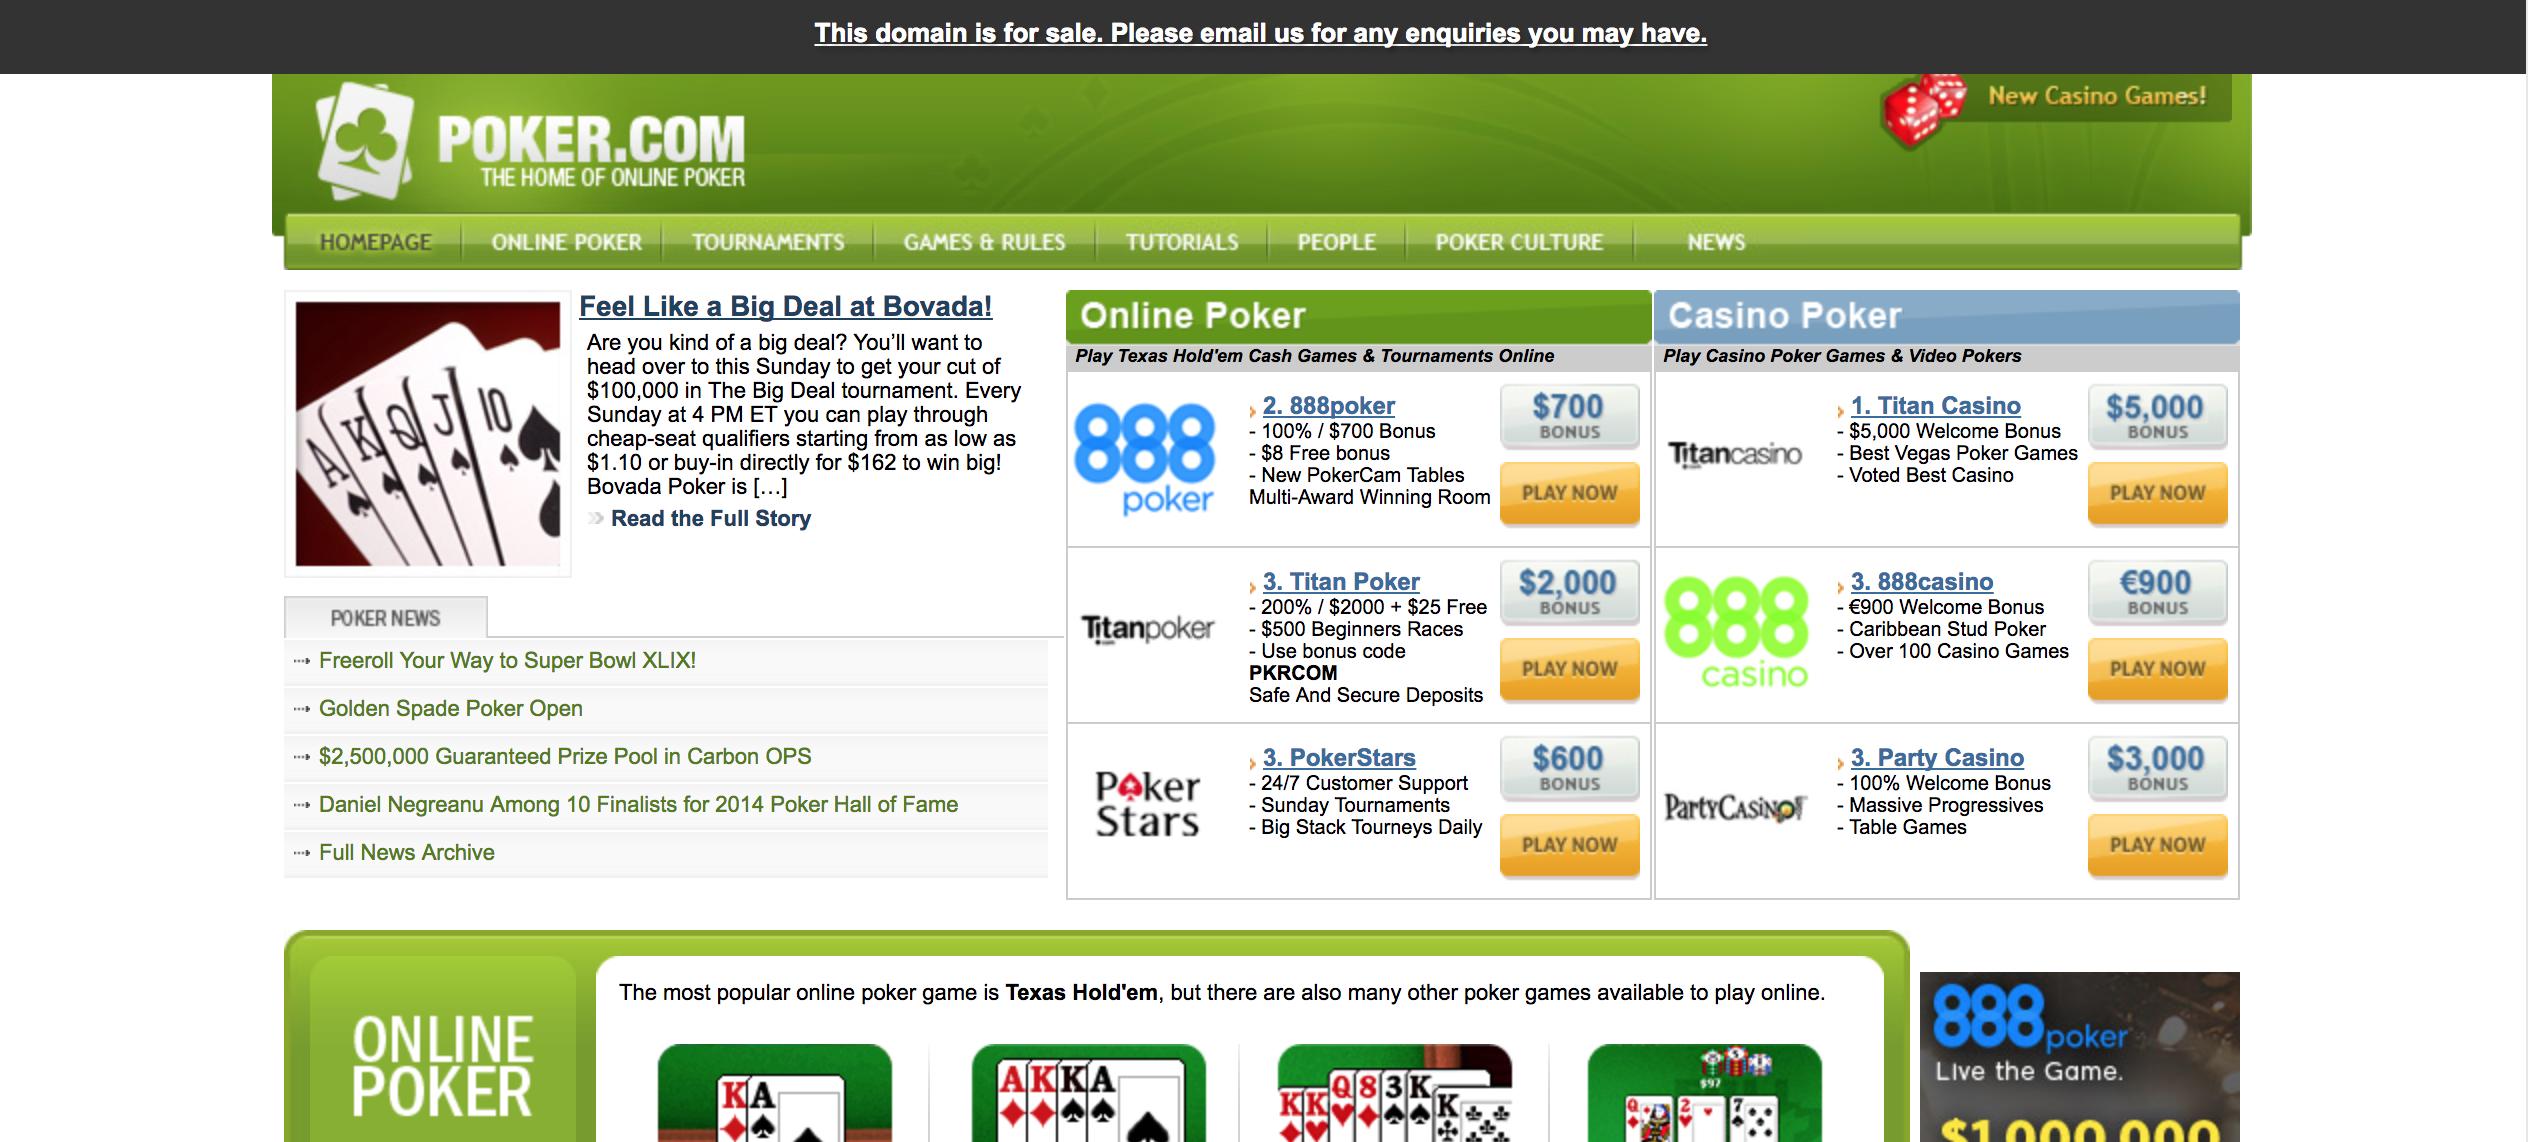 Pokercom_for_sale